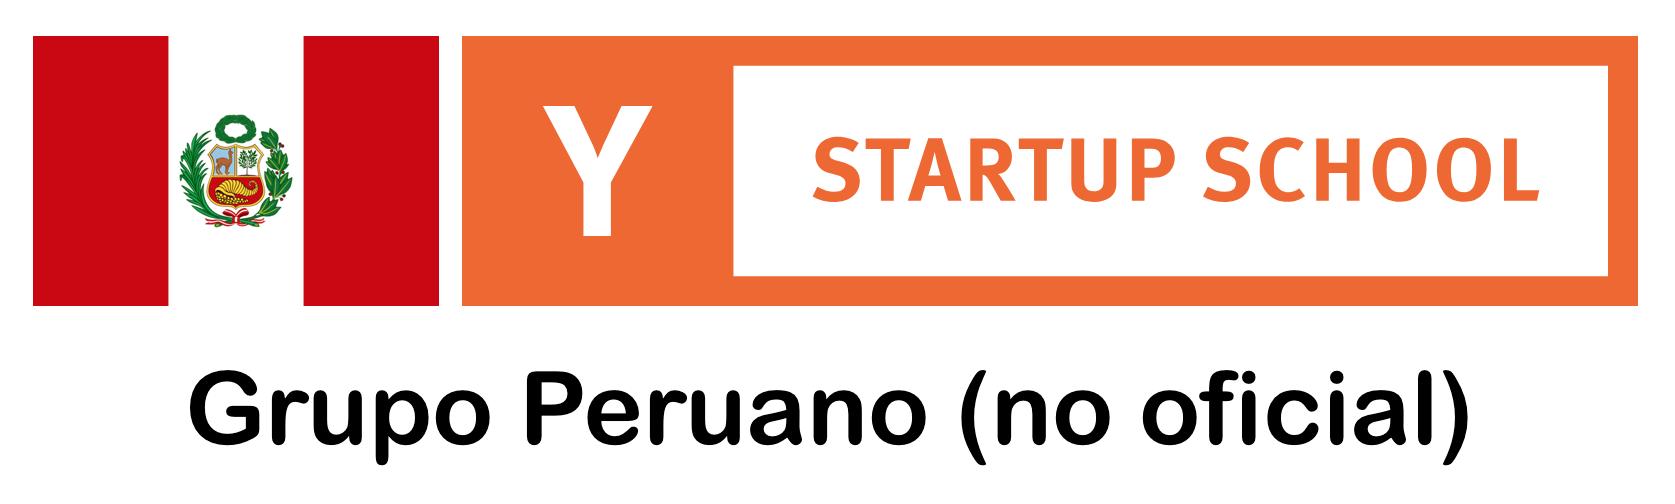 yc-startupschool-peru2.png